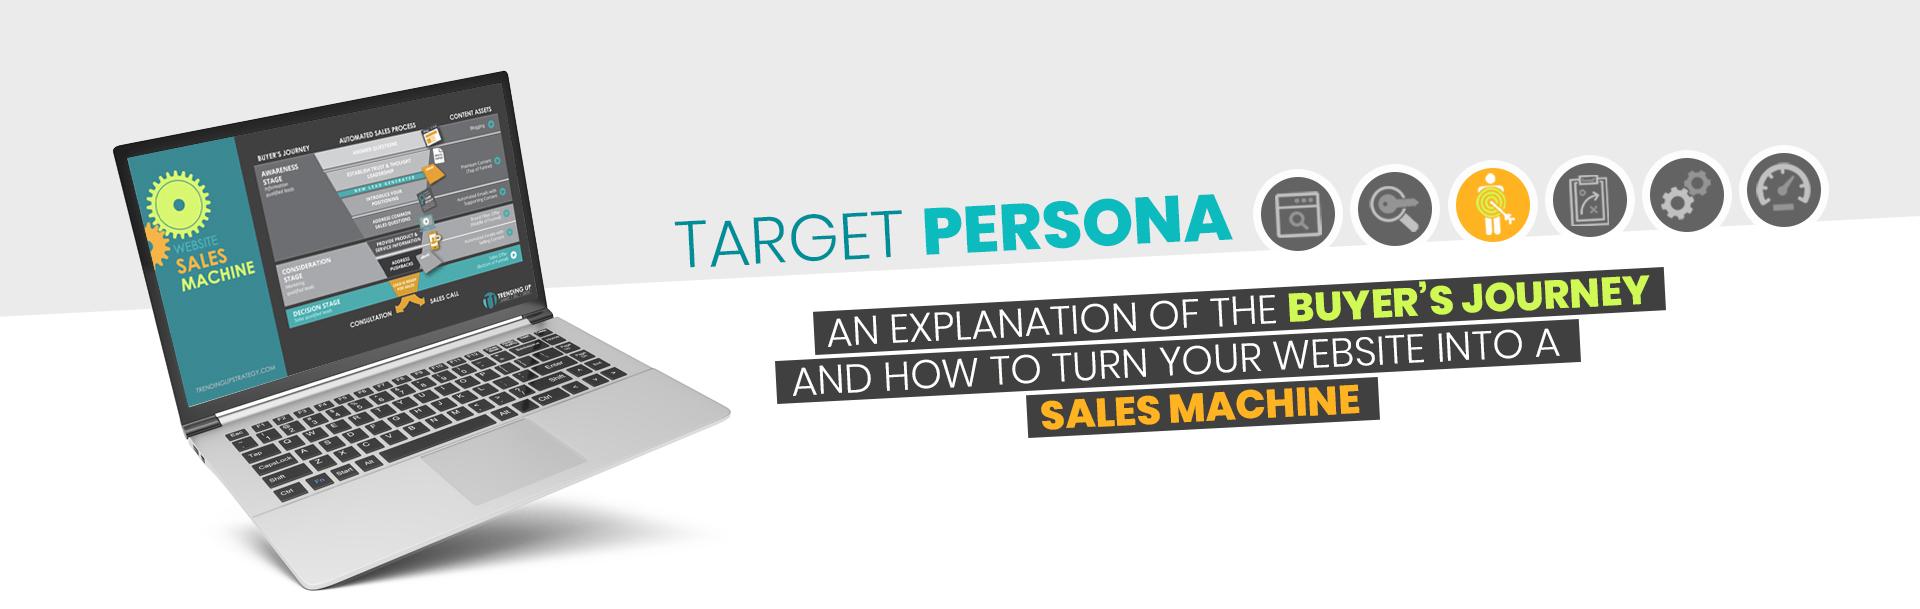 Target Persona - Sales Machine